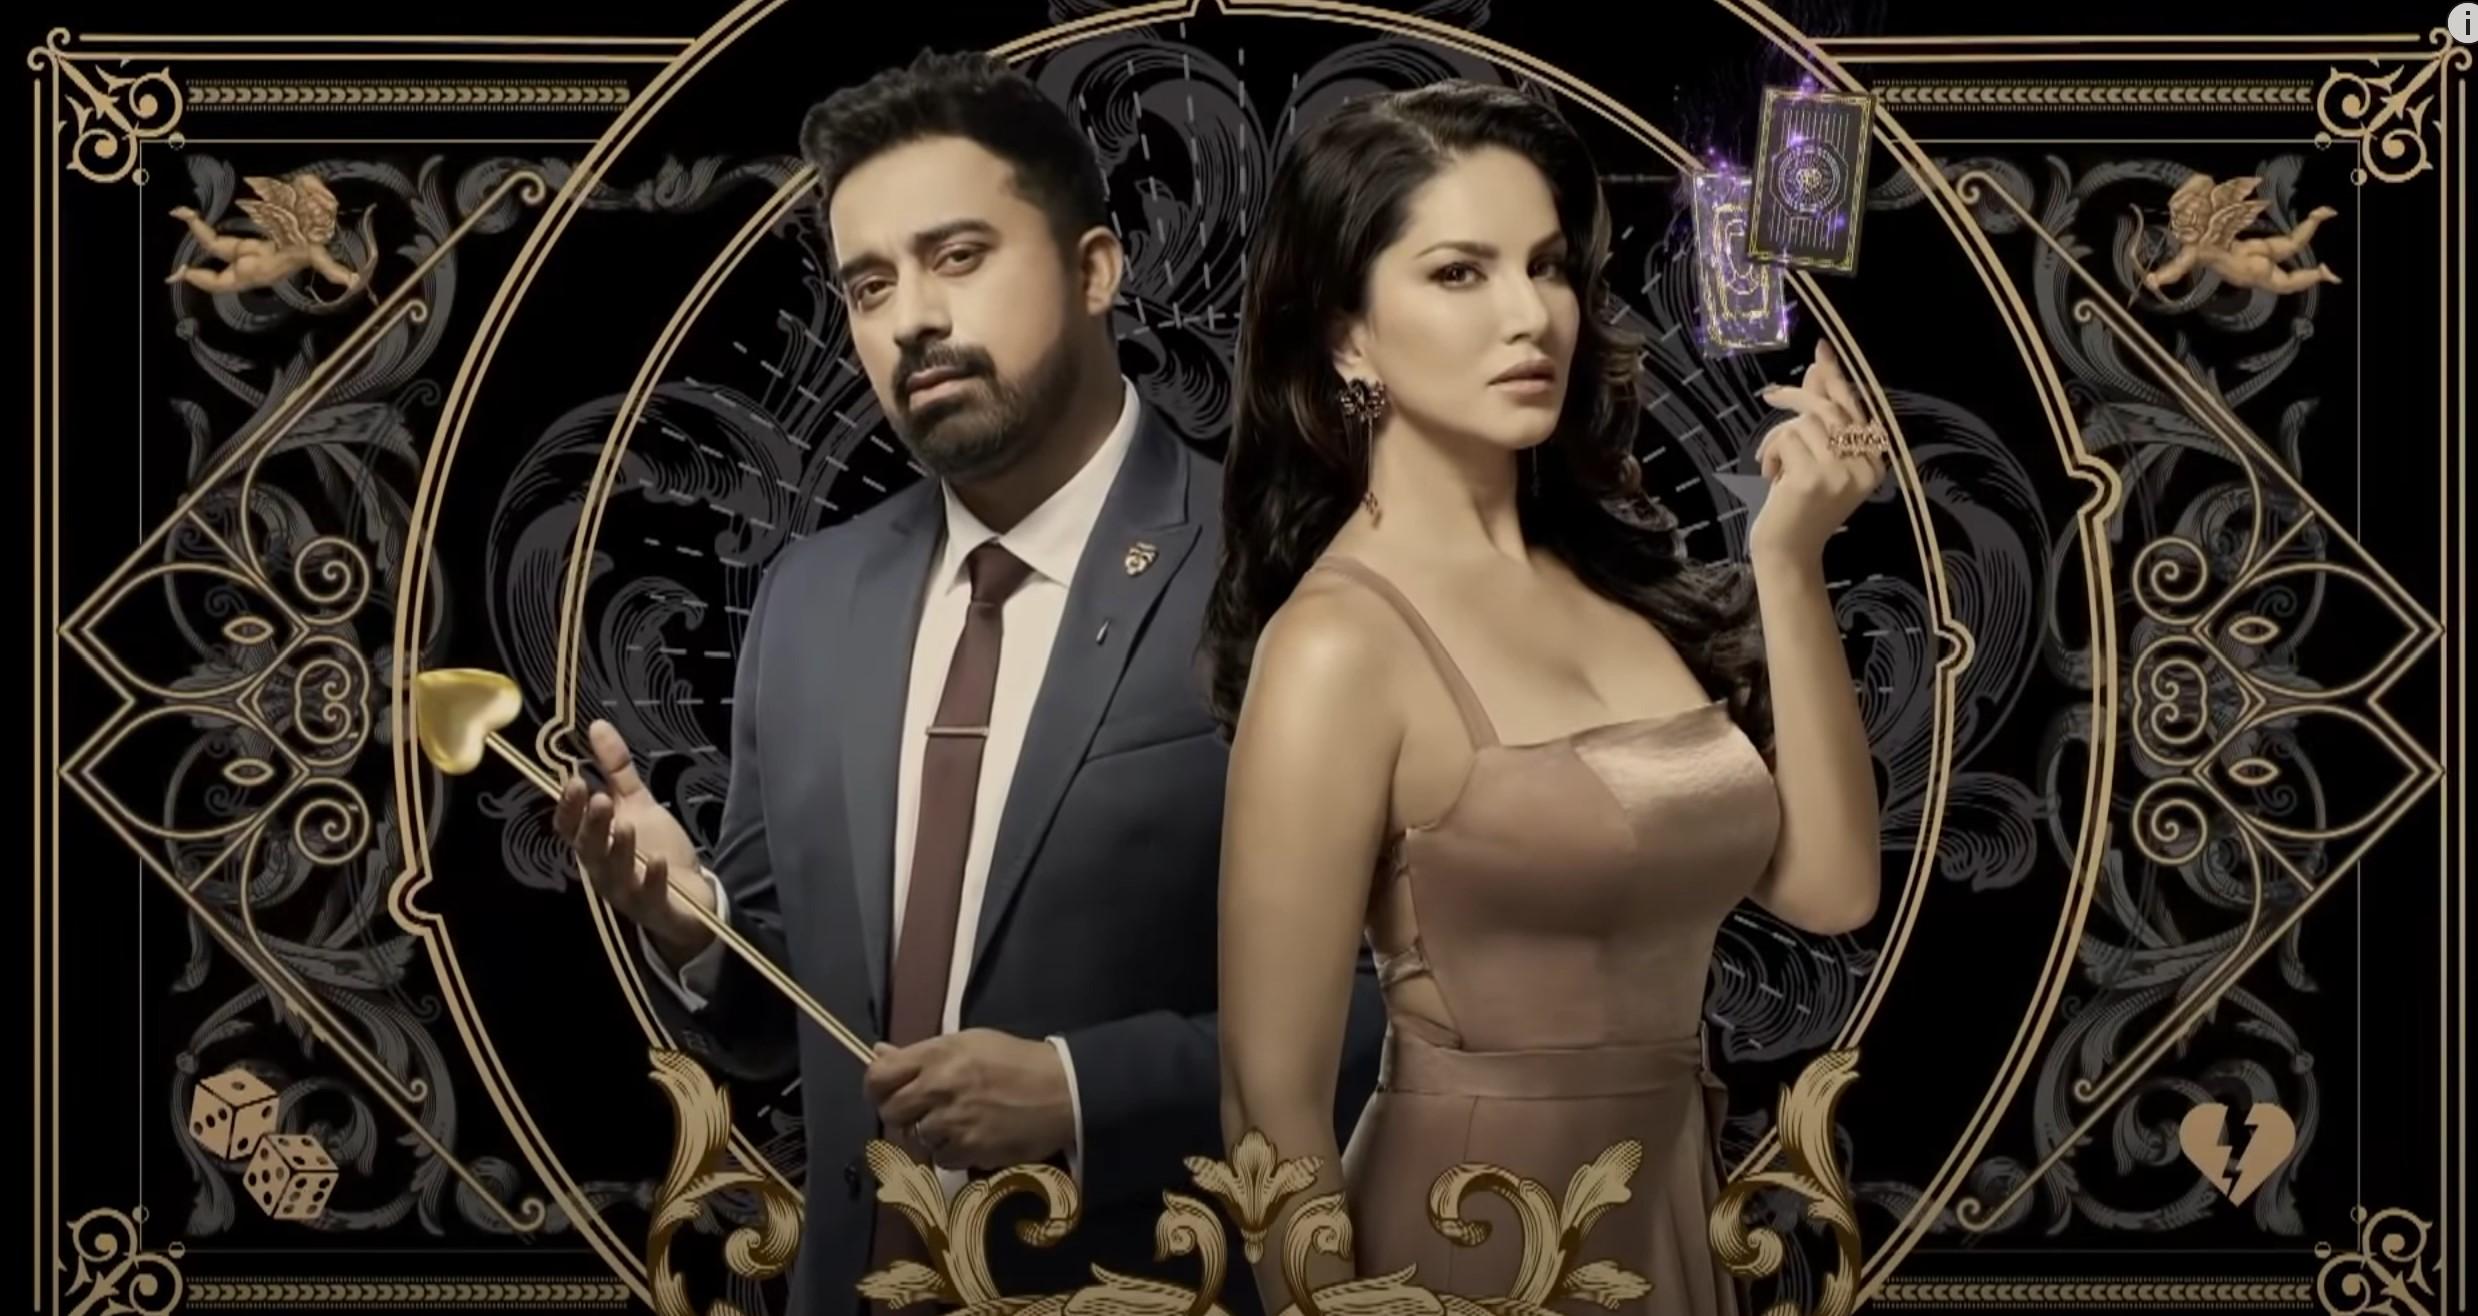 MTV Splitsvilla X3 Season 13 All New Episodes Watch Online For Free! Sunny Leone & Rannvijay Singha